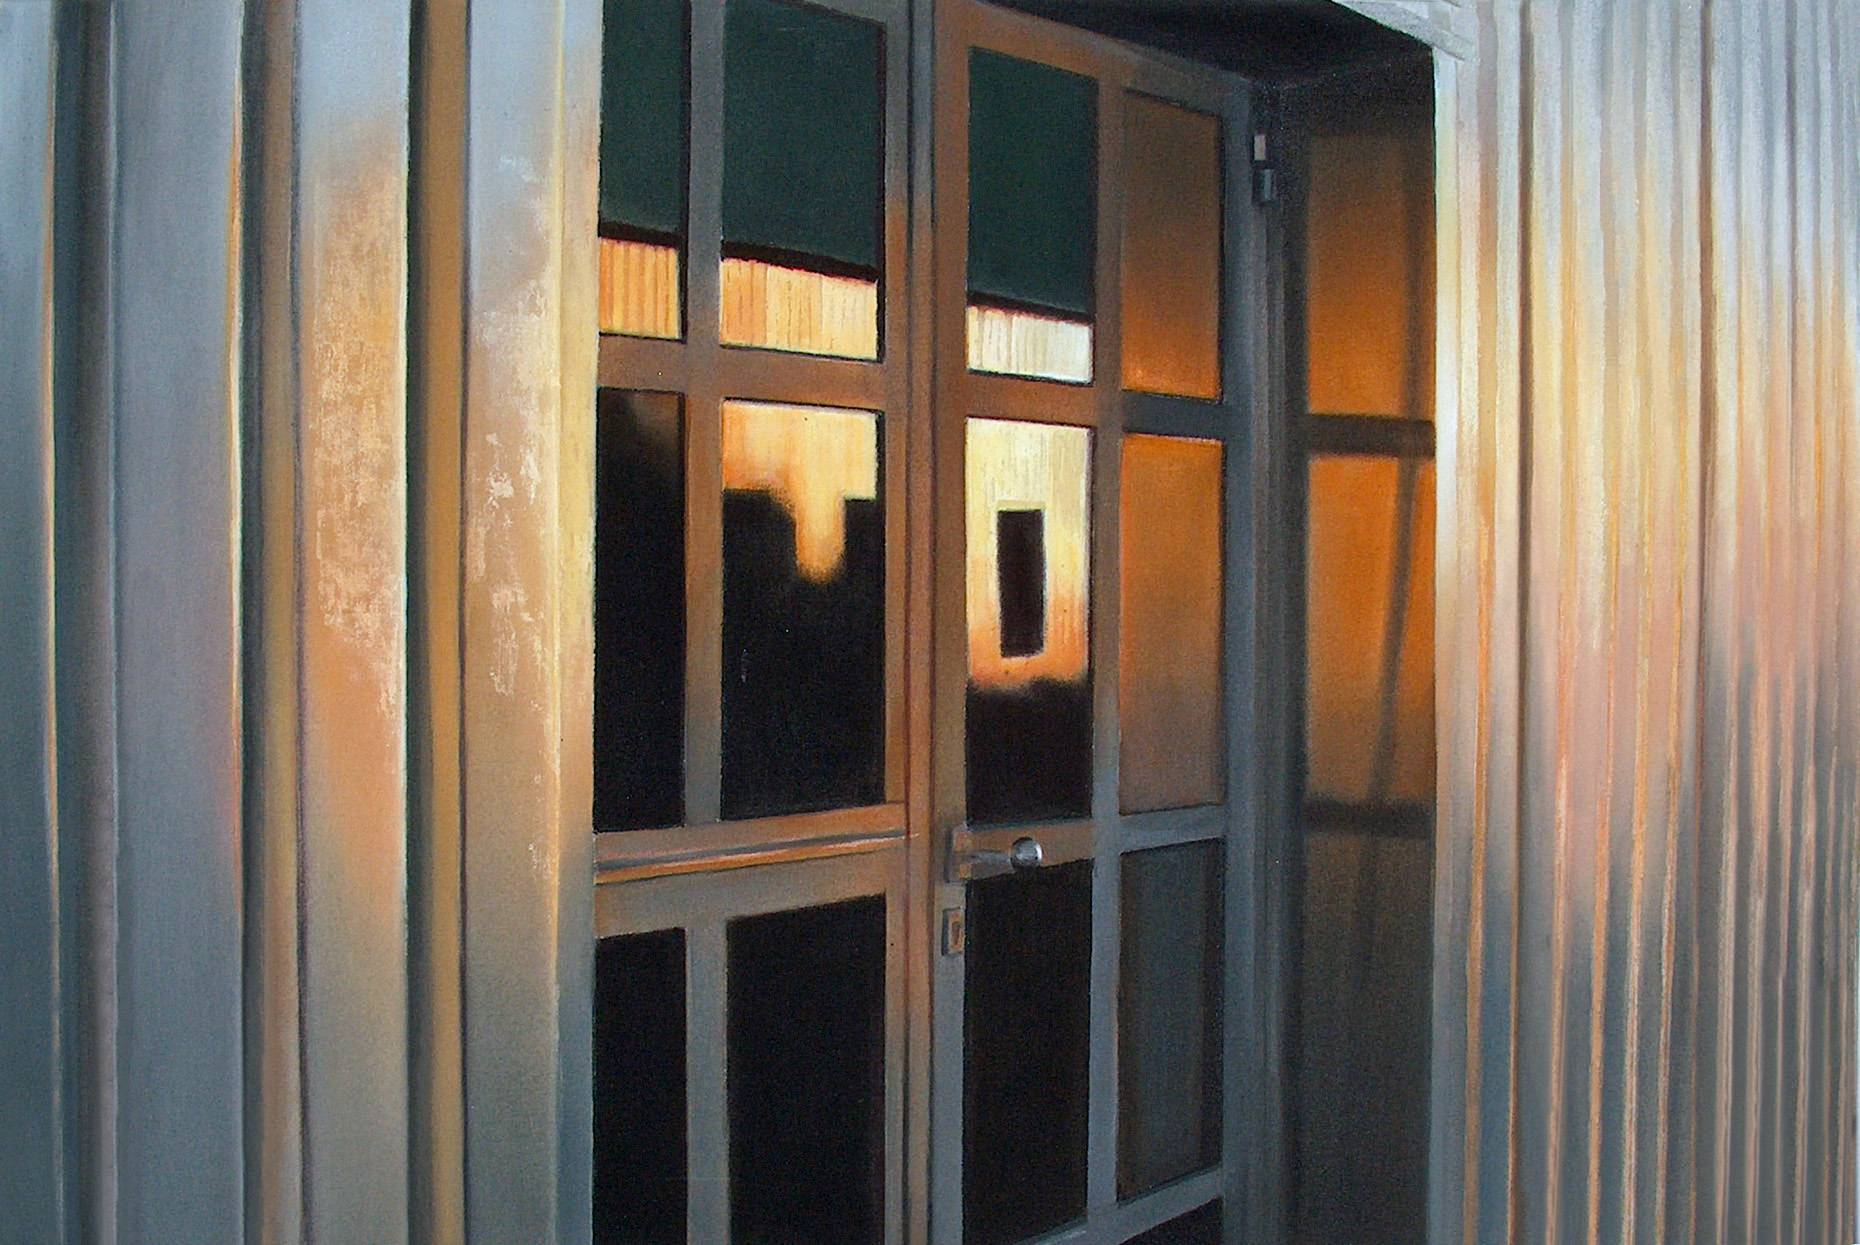 Raketenstation Hombroich 13 1998 Aquarell- u. Acrylfarbe a/Nessel 60 x 90 cm